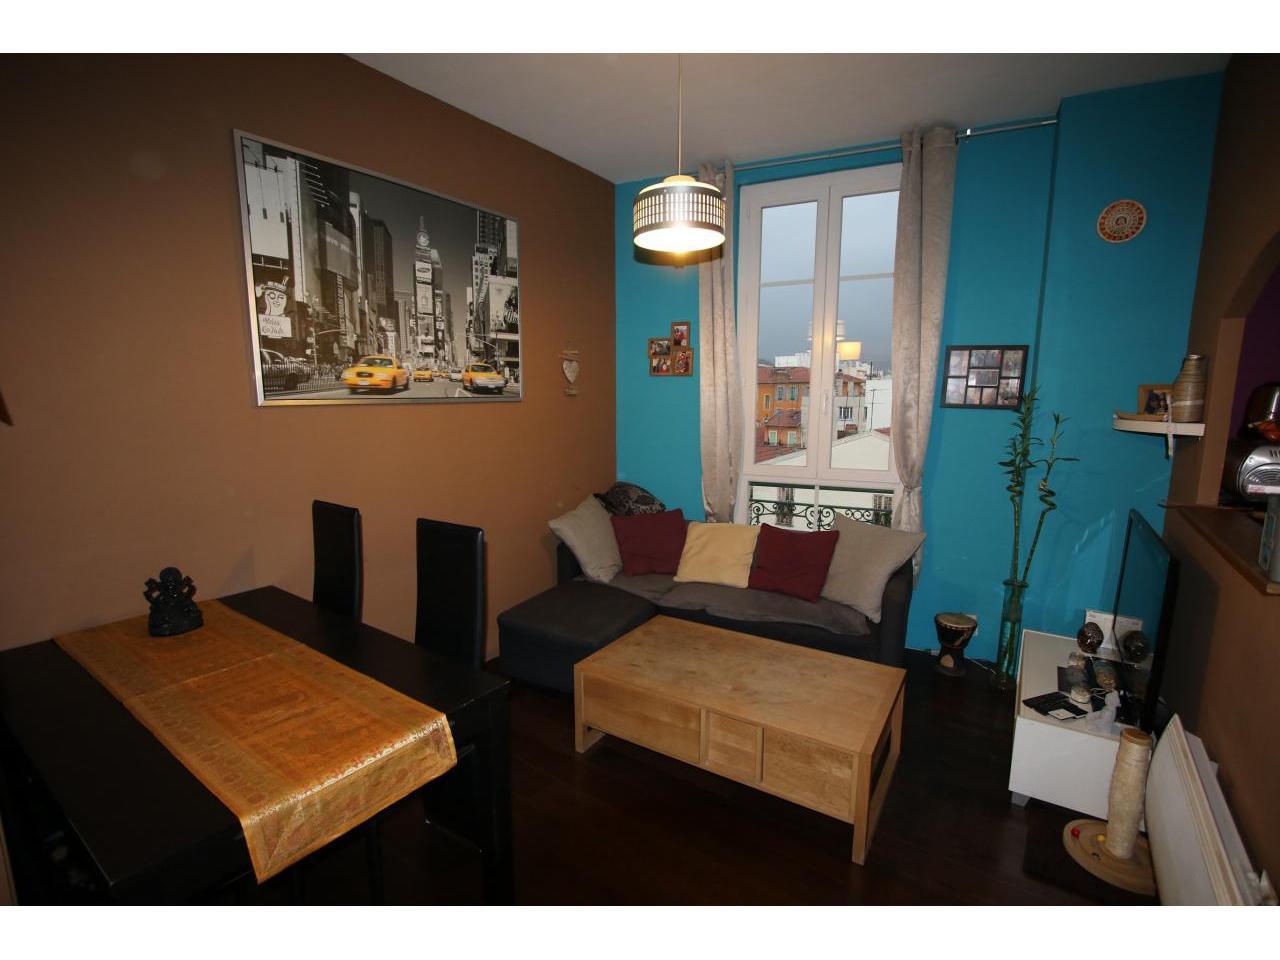 immobilier appartement nice appartement 2 pieces 393 m a vendre. Black Bedroom Furniture Sets. Home Design Ideas